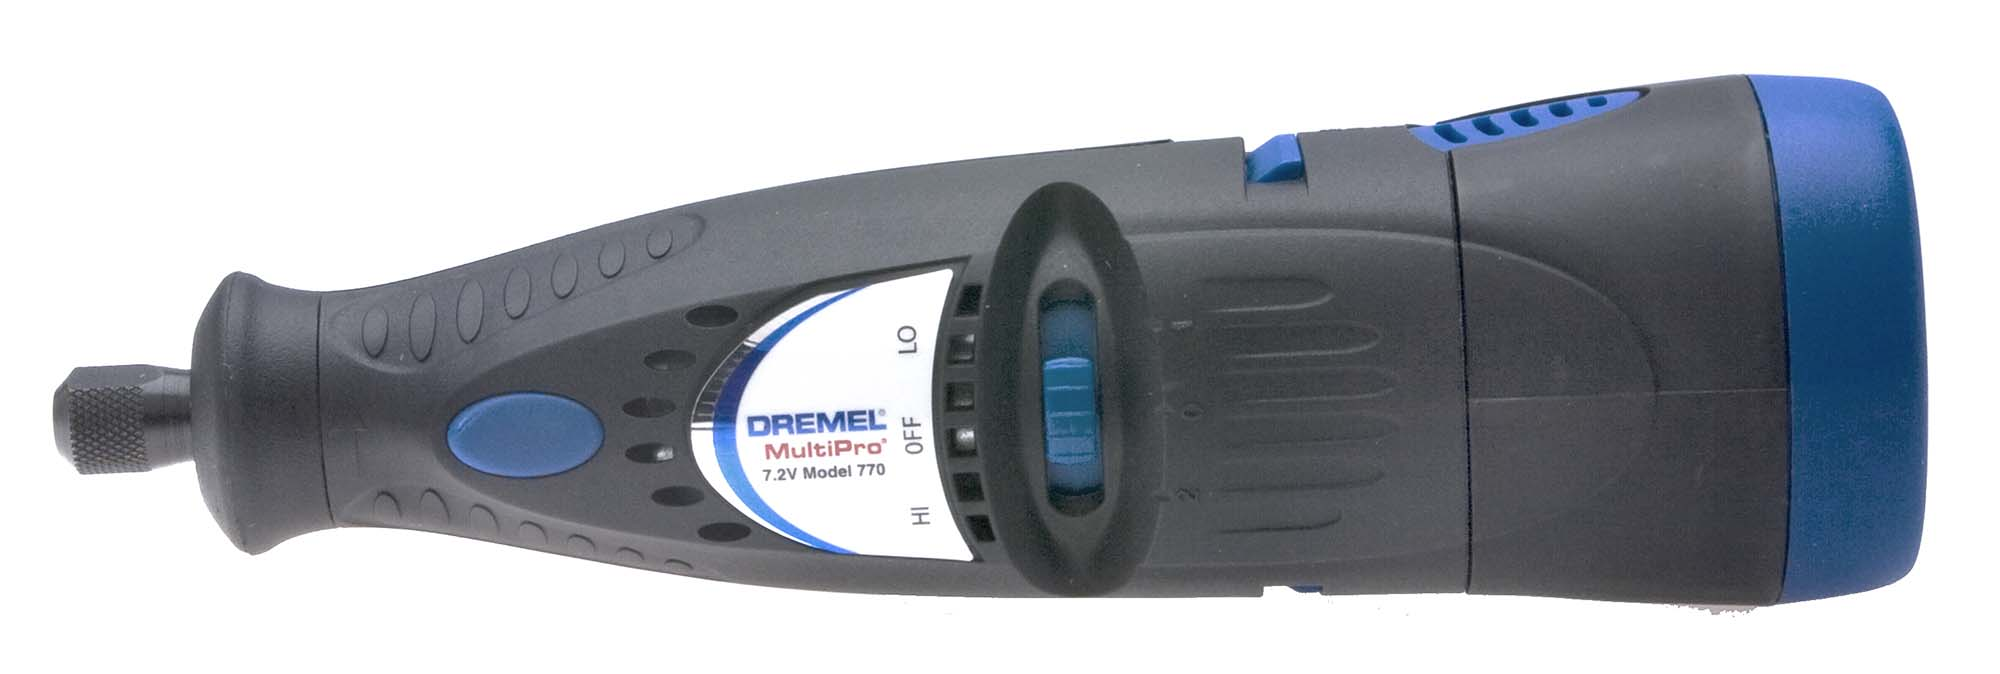 Dremel MiniMite Cordless Rotary Tool